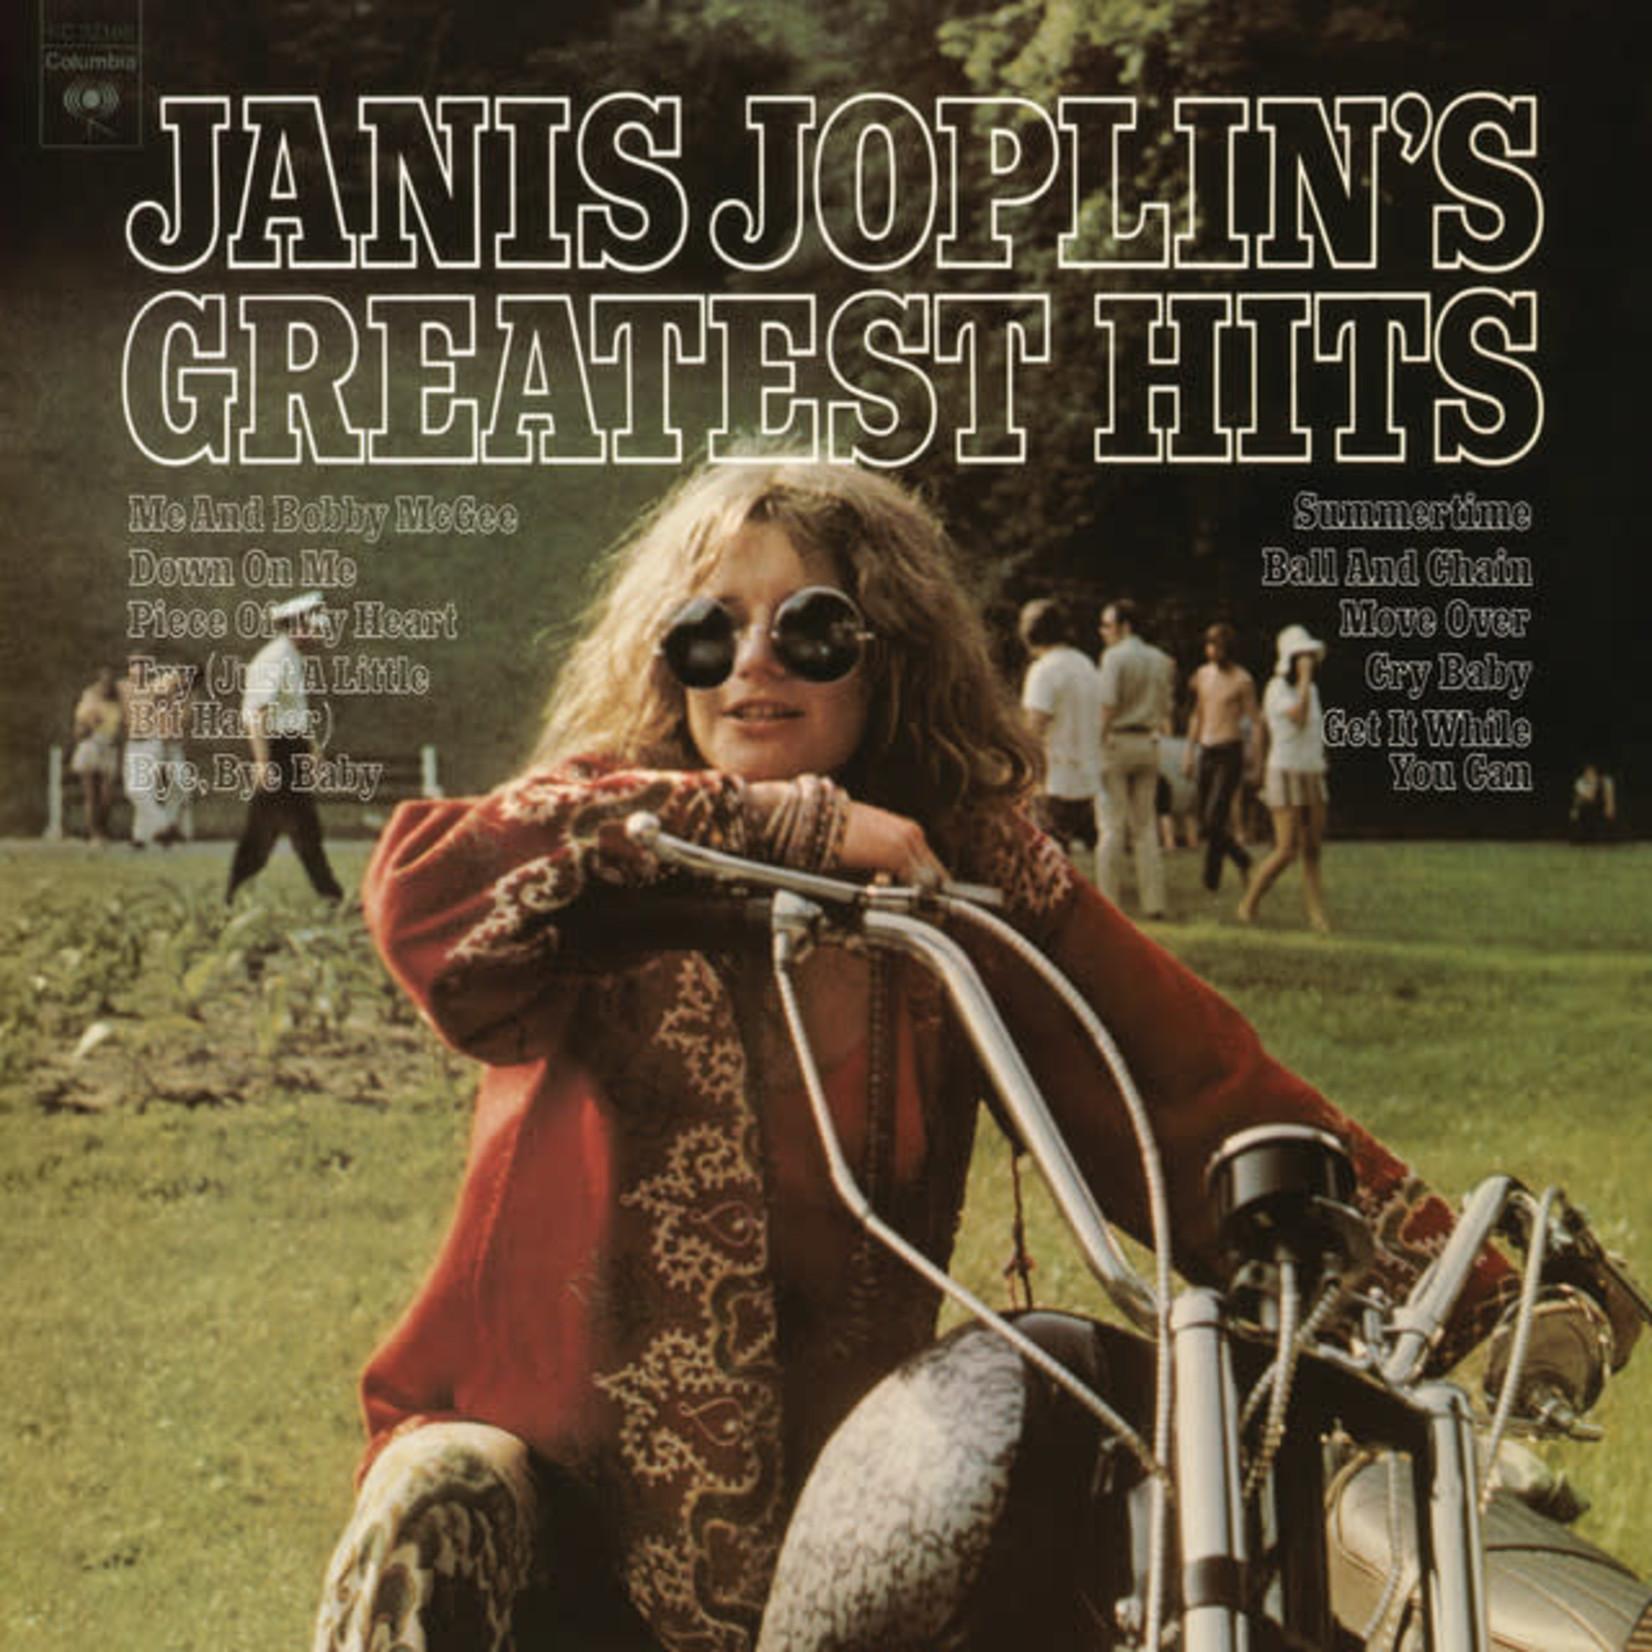 Vinyl Janis Joplin - Greatest Hits